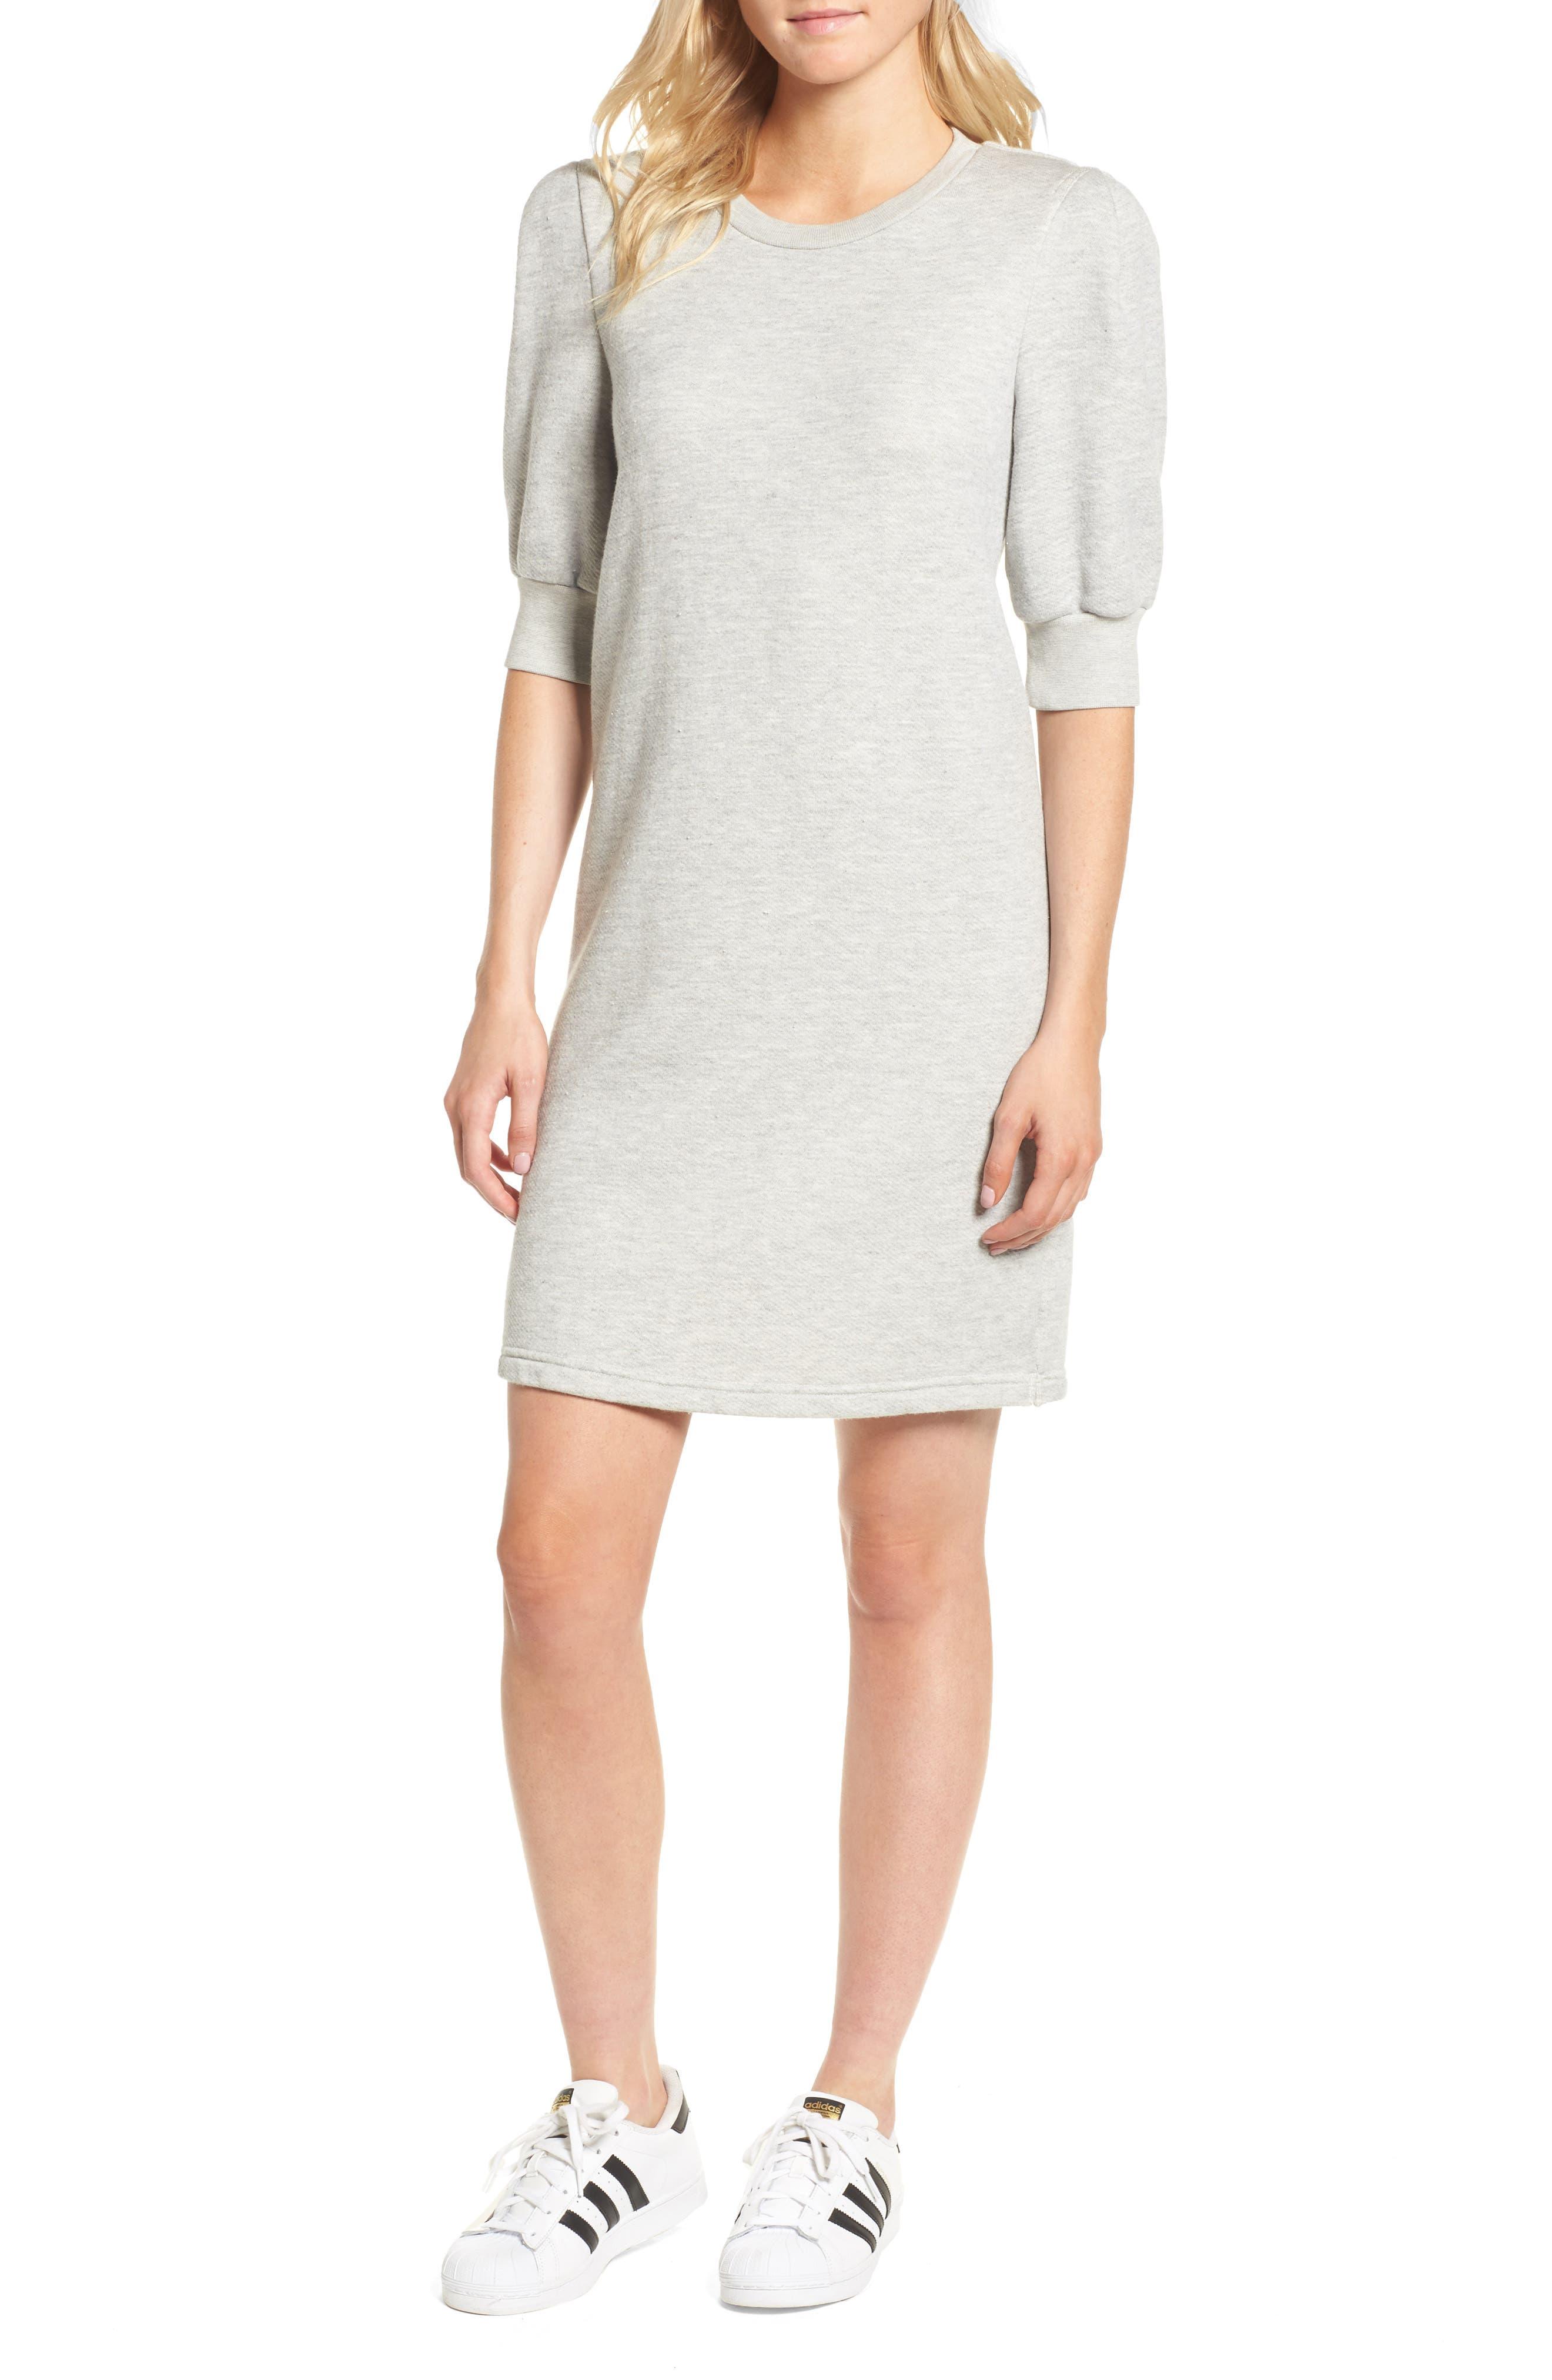 The Pleat Sweatshirt Dress,                             Main thumbnail 1, color,                             062